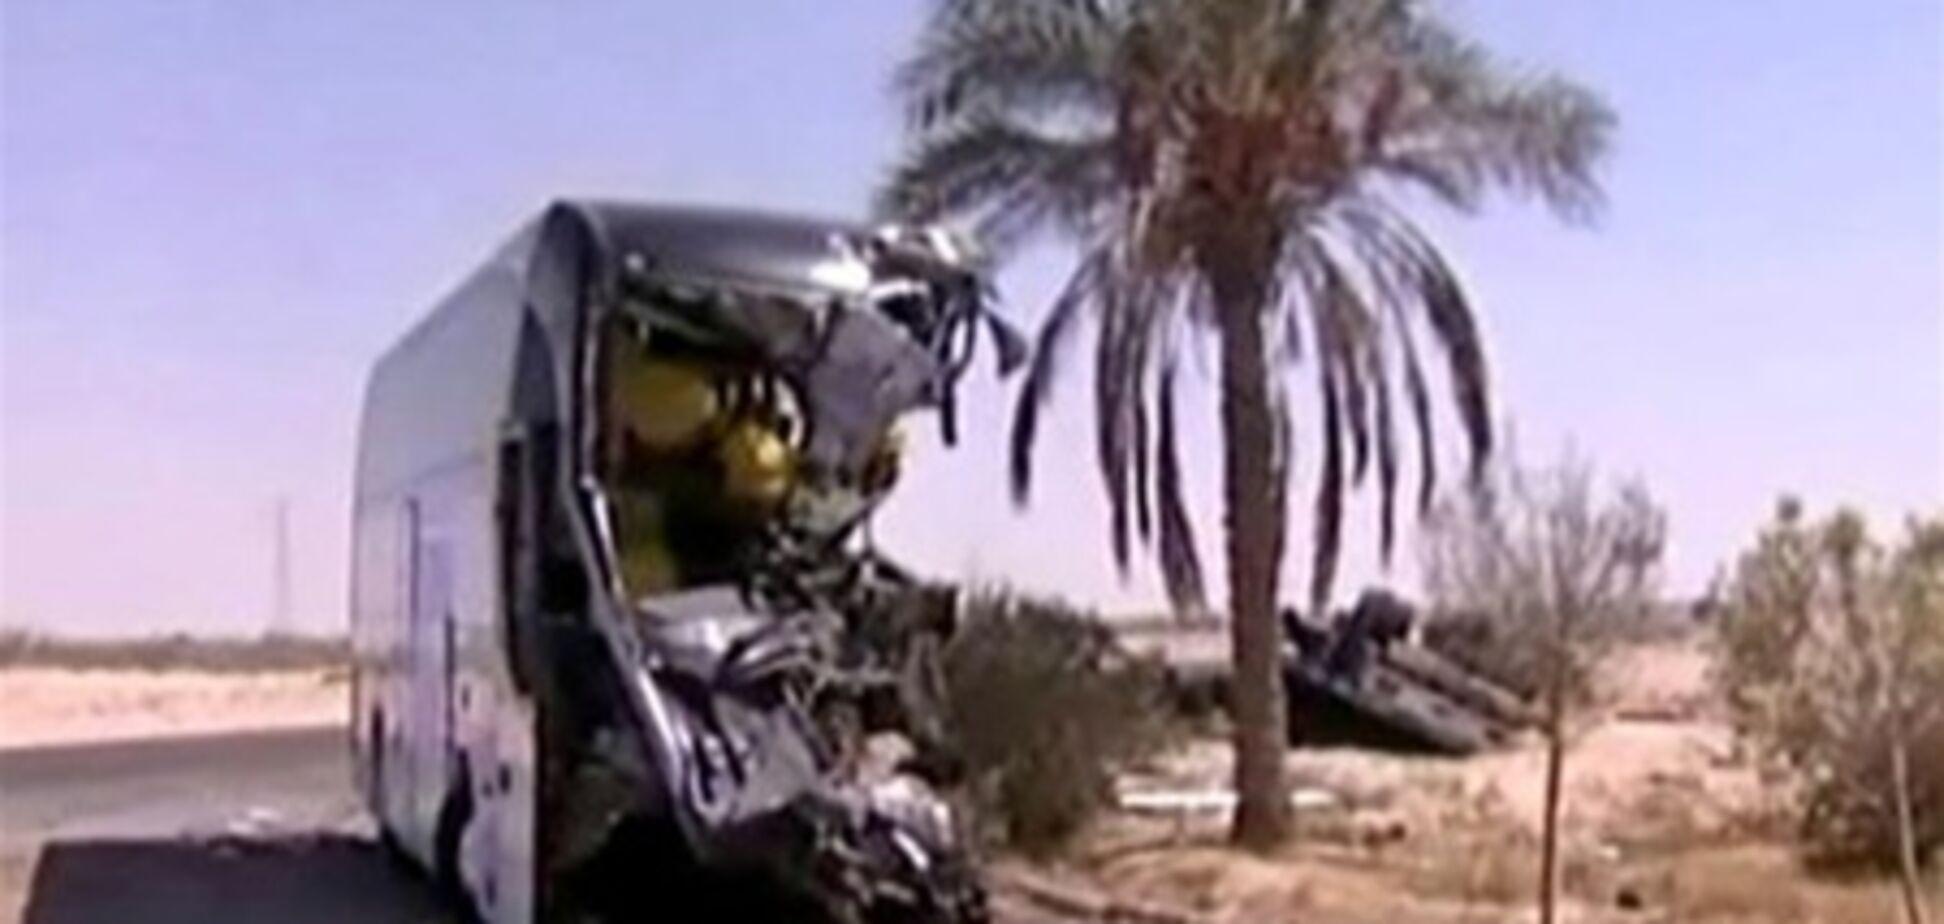 Два автобуси з туристами потрапили в ДТП в Єгипті: 9 загиблих, 25 постраждалих